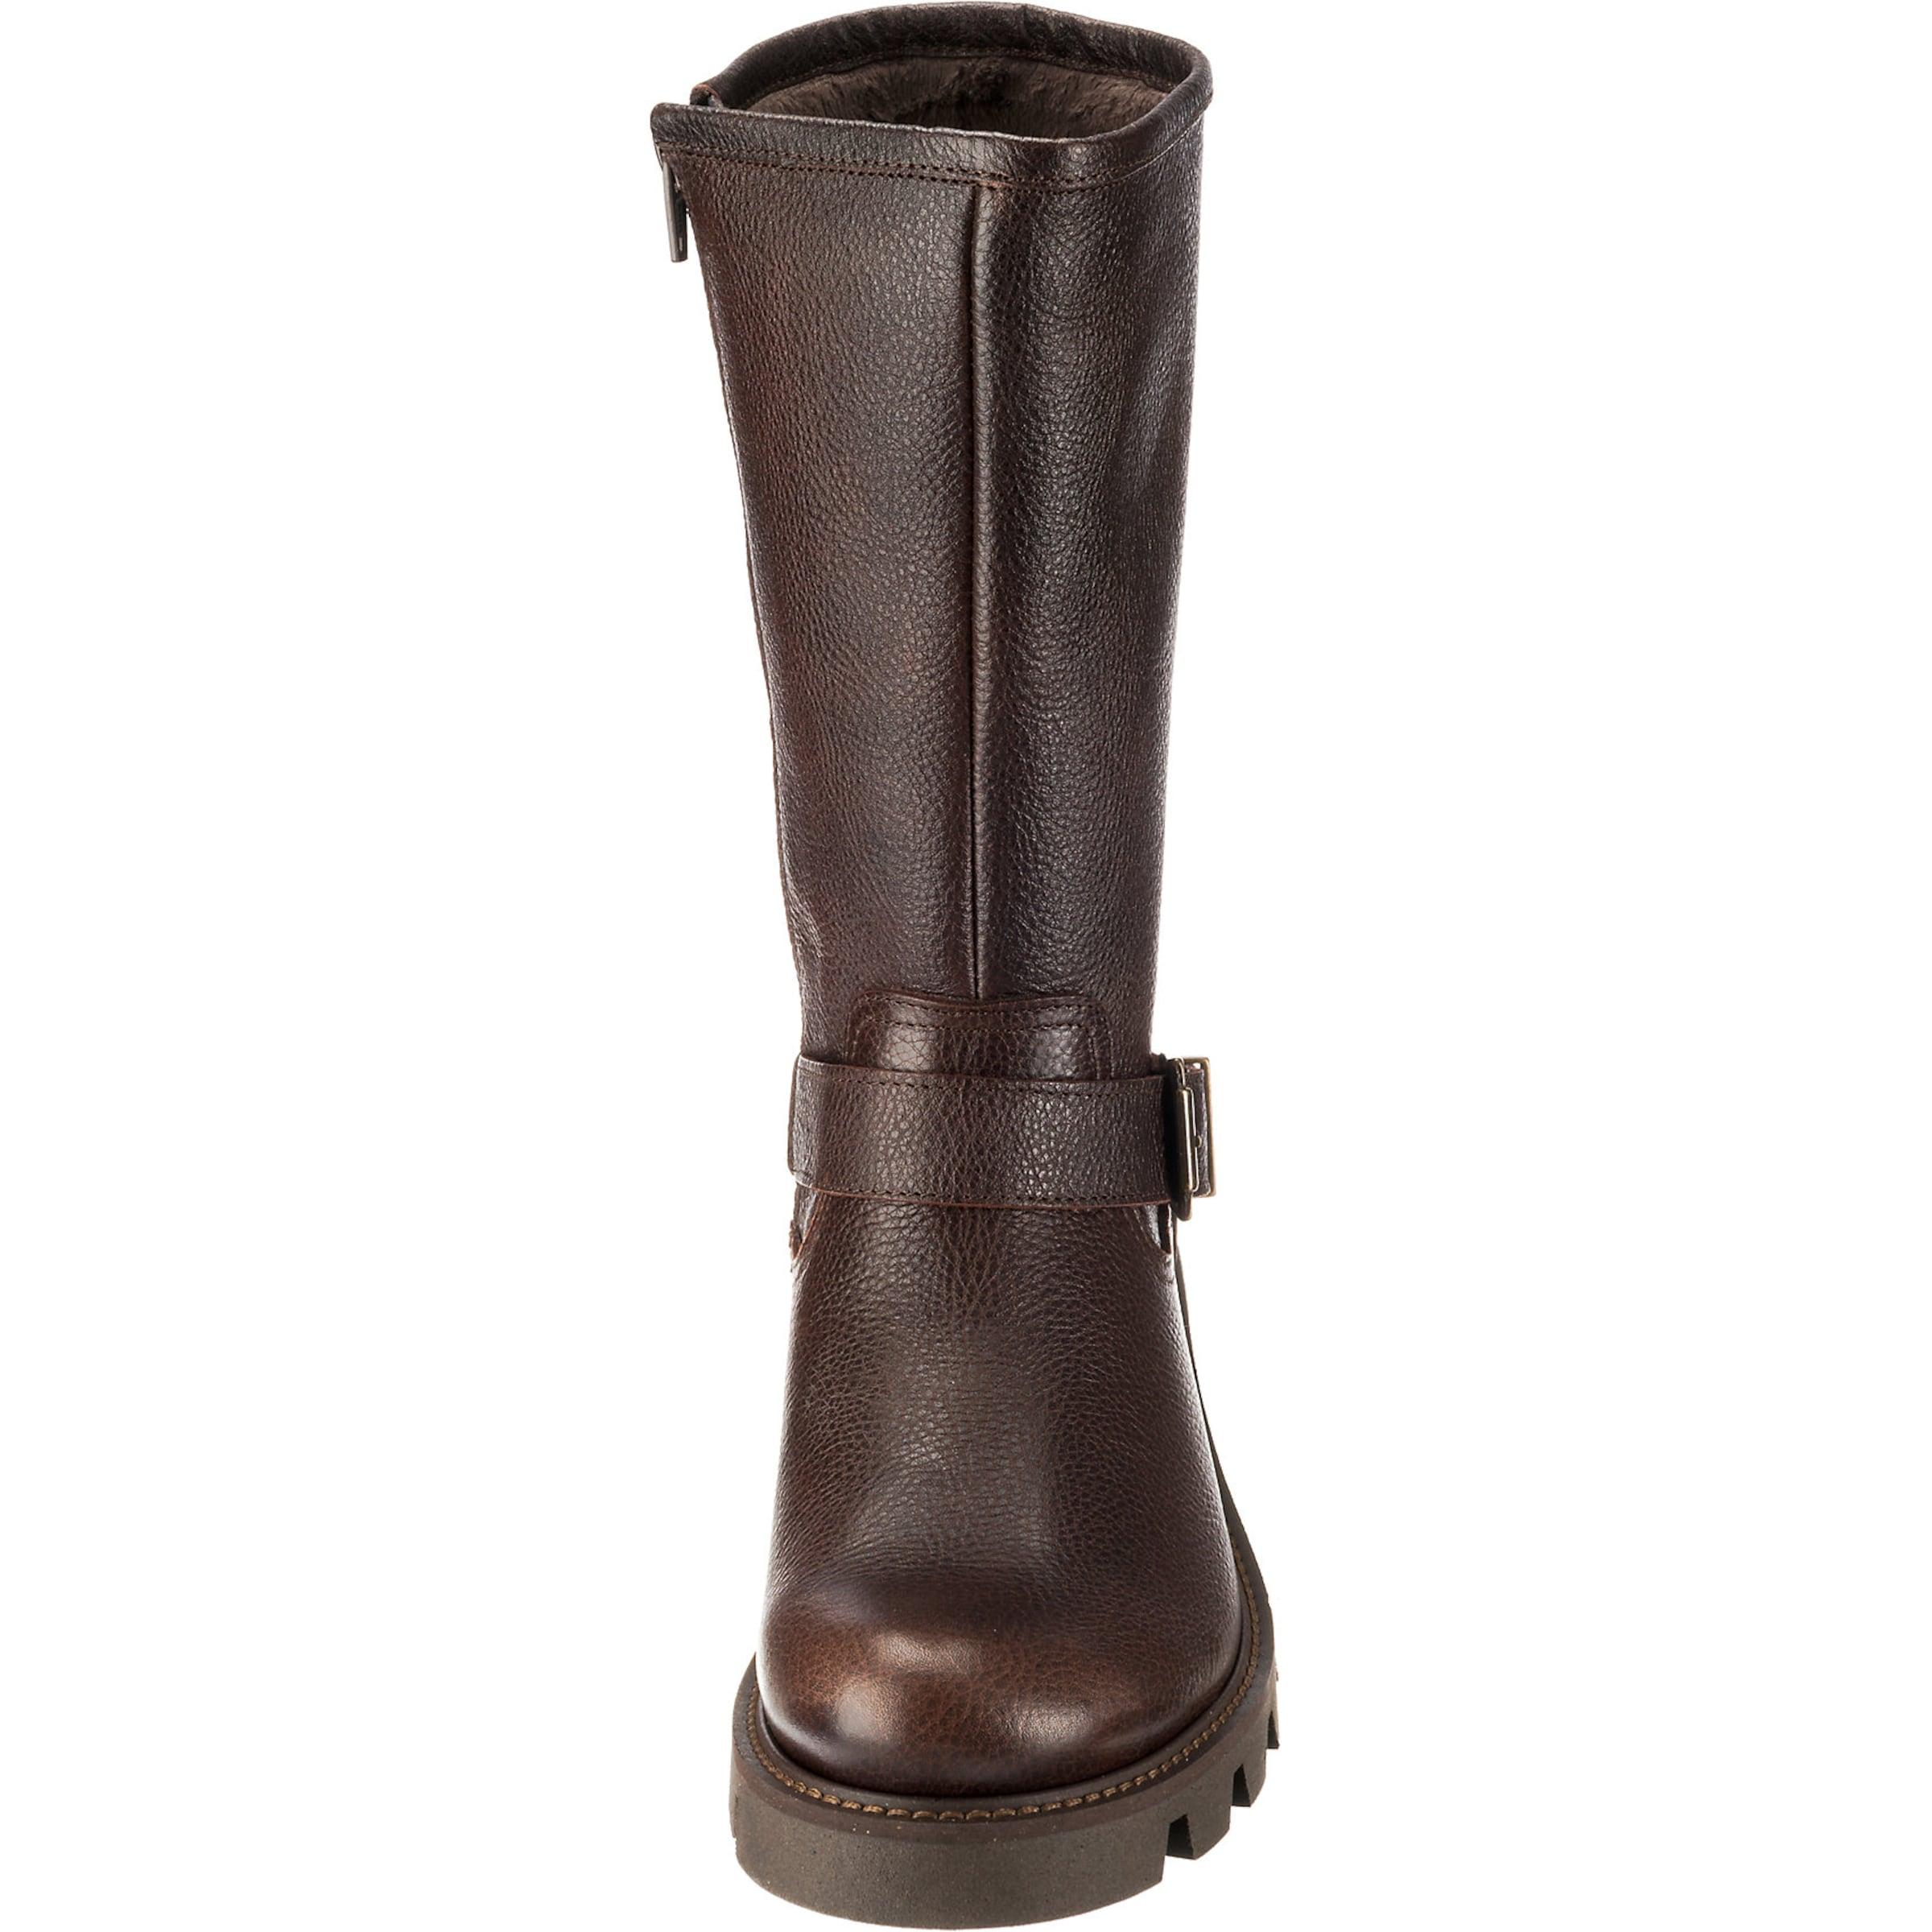 Jolanaamp; Boots Fenena In Braun Biker BxCreWQdo